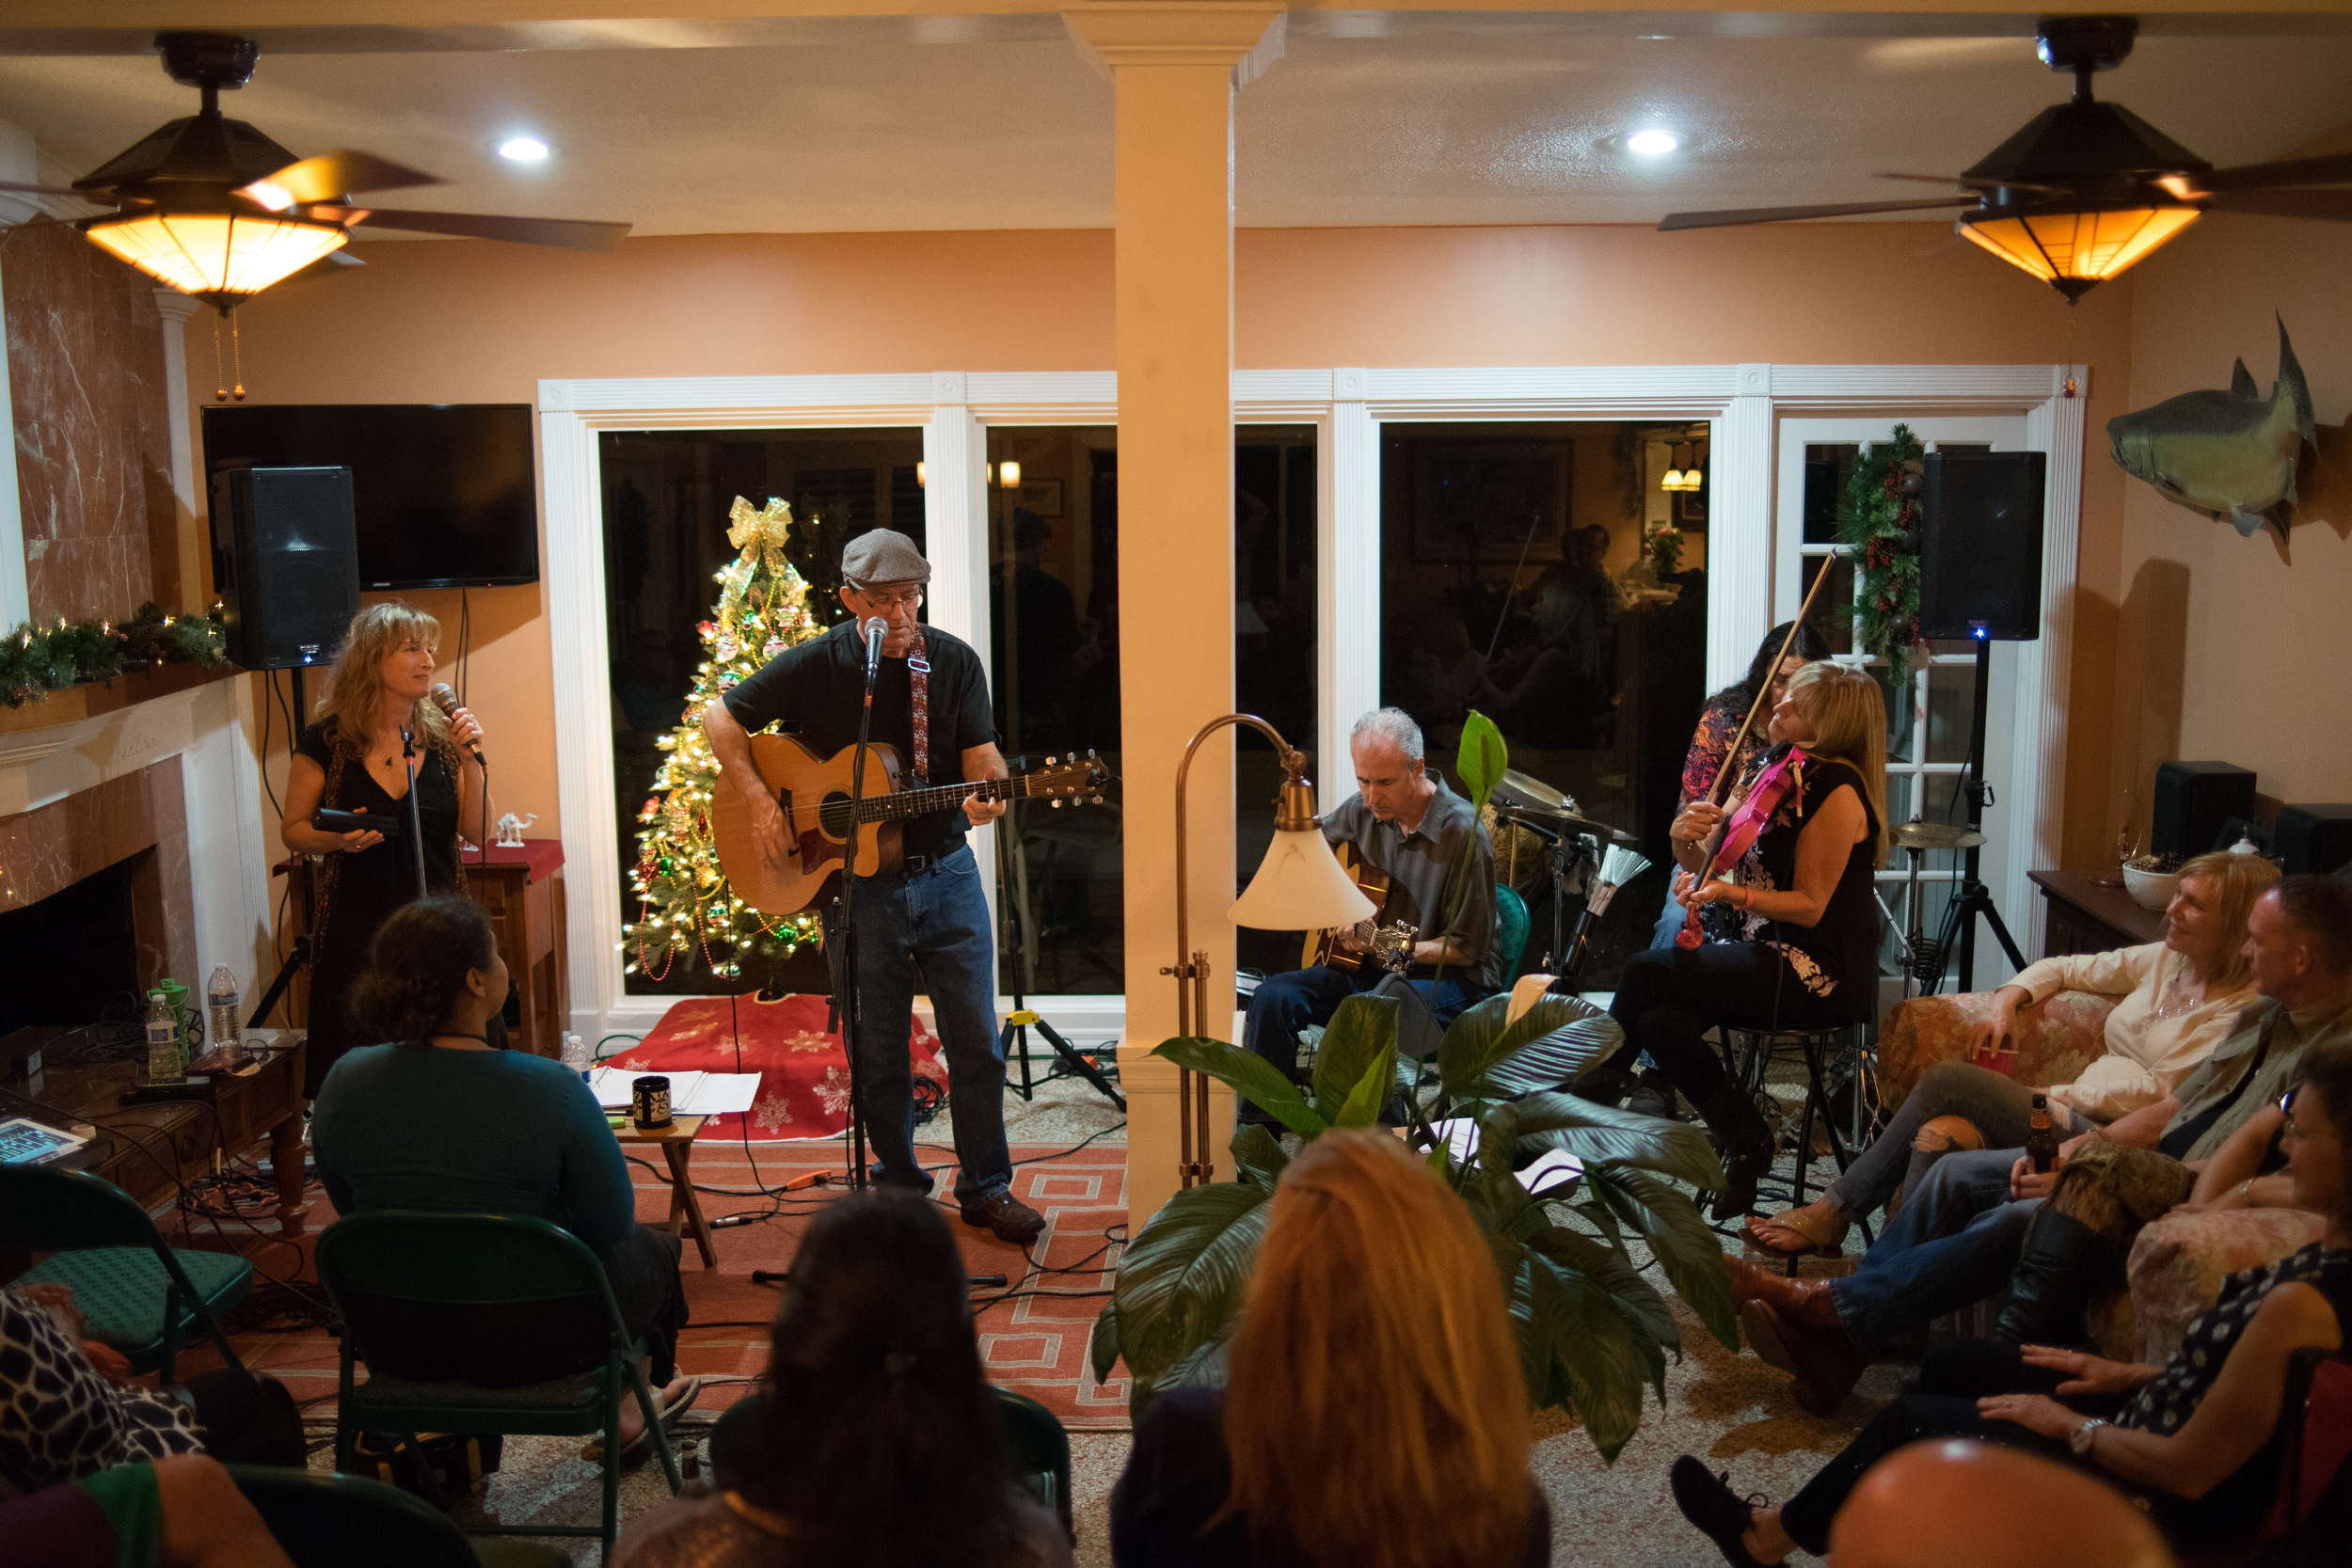 JMP at St. Petersburg, FL House Concert December 12, 2015, photo credit: Mitchel Frick